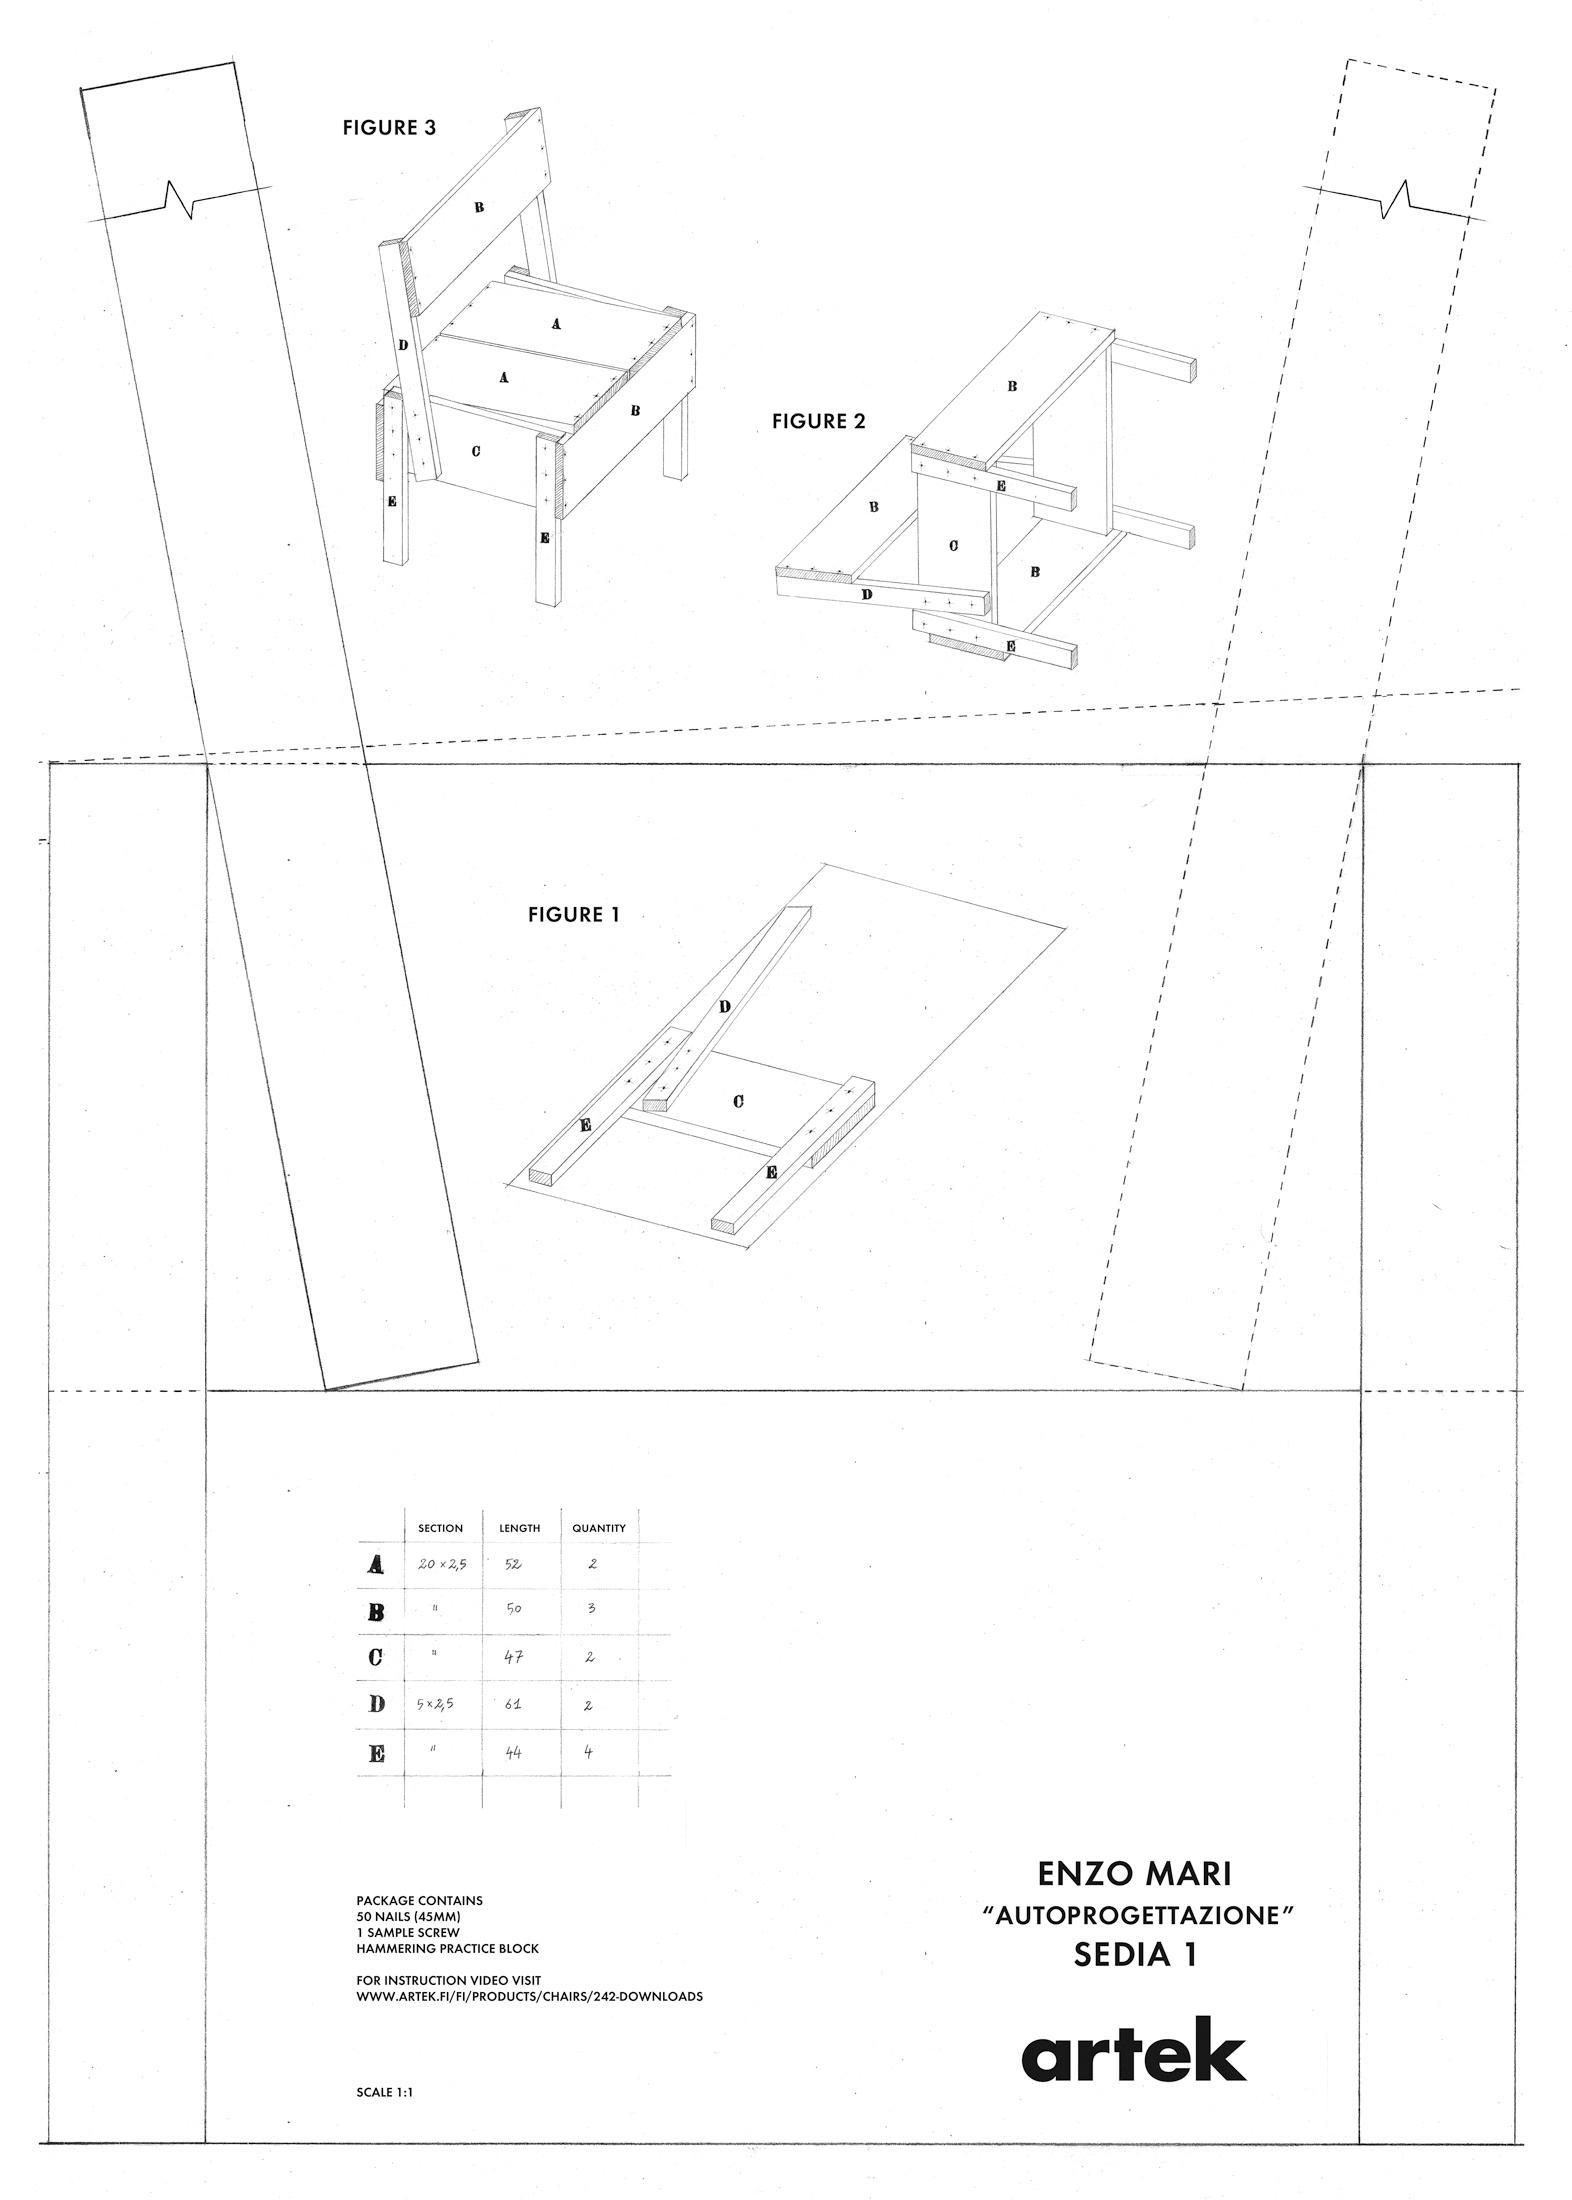 Sedia 1 chair restaurant chairs from artek architonic for Sedia 1 enzo mari